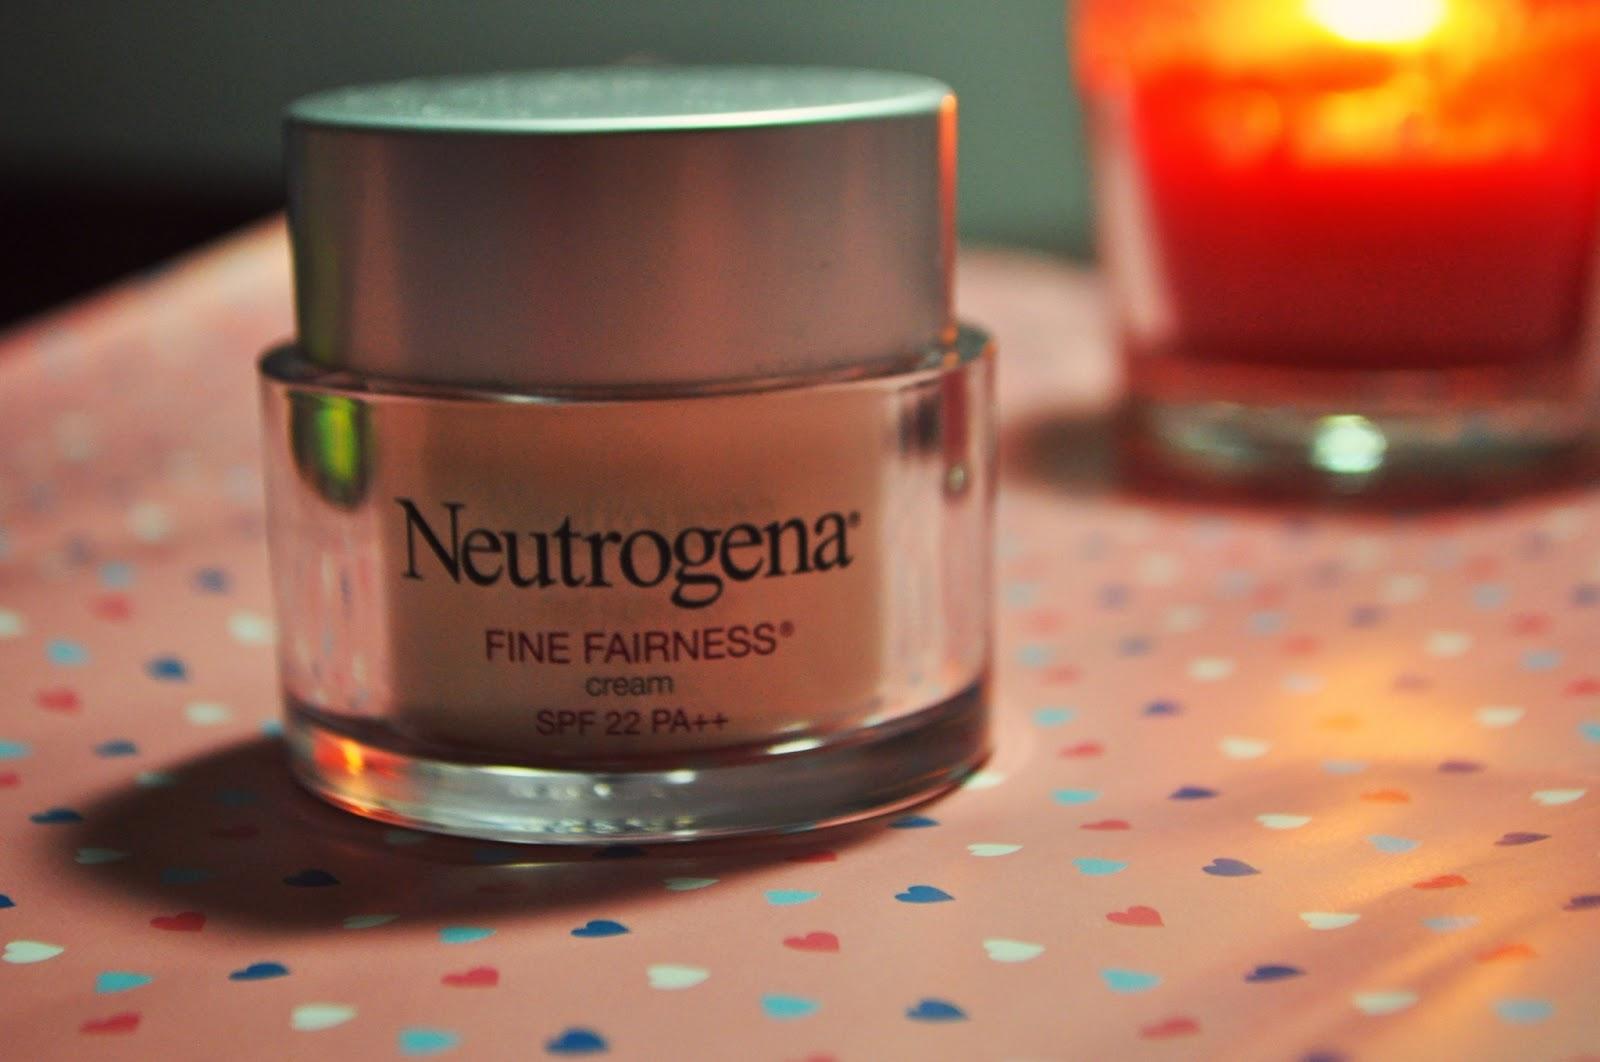 neutrogena fine fairness eye cream review